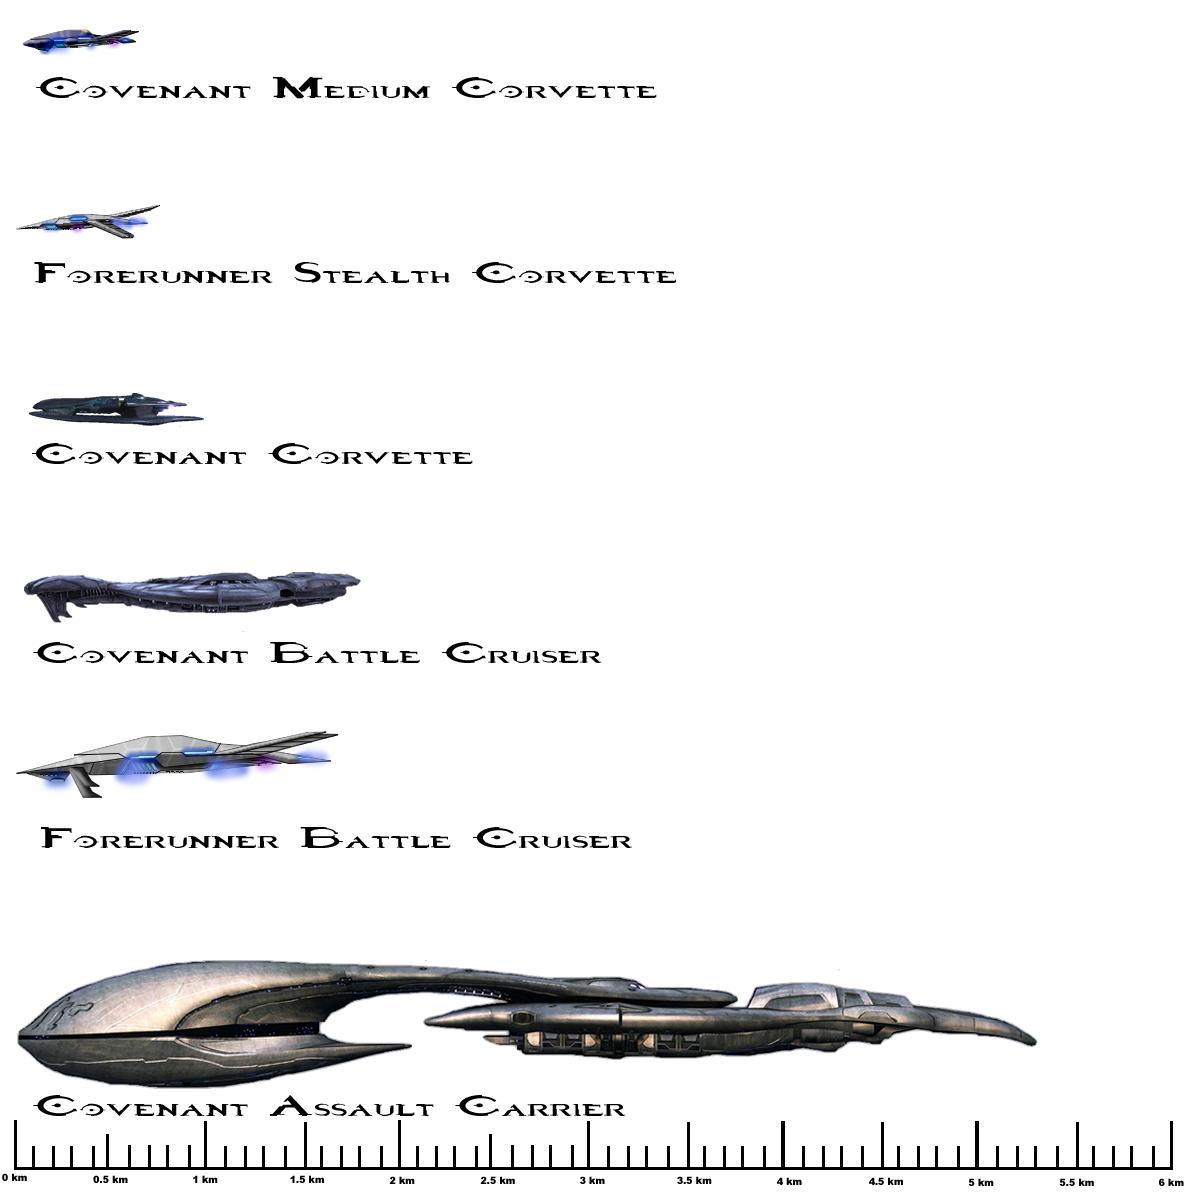 Digital Corvette Forum Corvette Z06 C7r Edition By Dangeruss On Deviantart Drn Liberty Walk Gtr